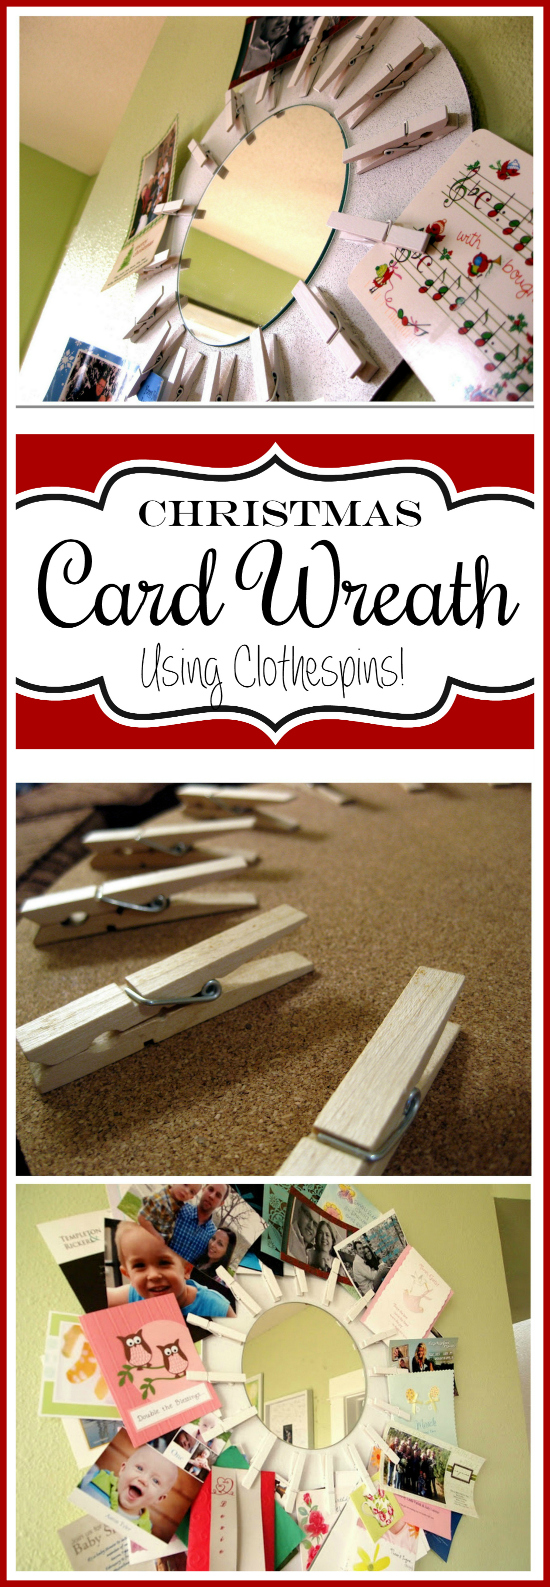 DIY Christmas Card Wreath ... using clothespins! SO SIMPLE! {Sawdust & Embryos}